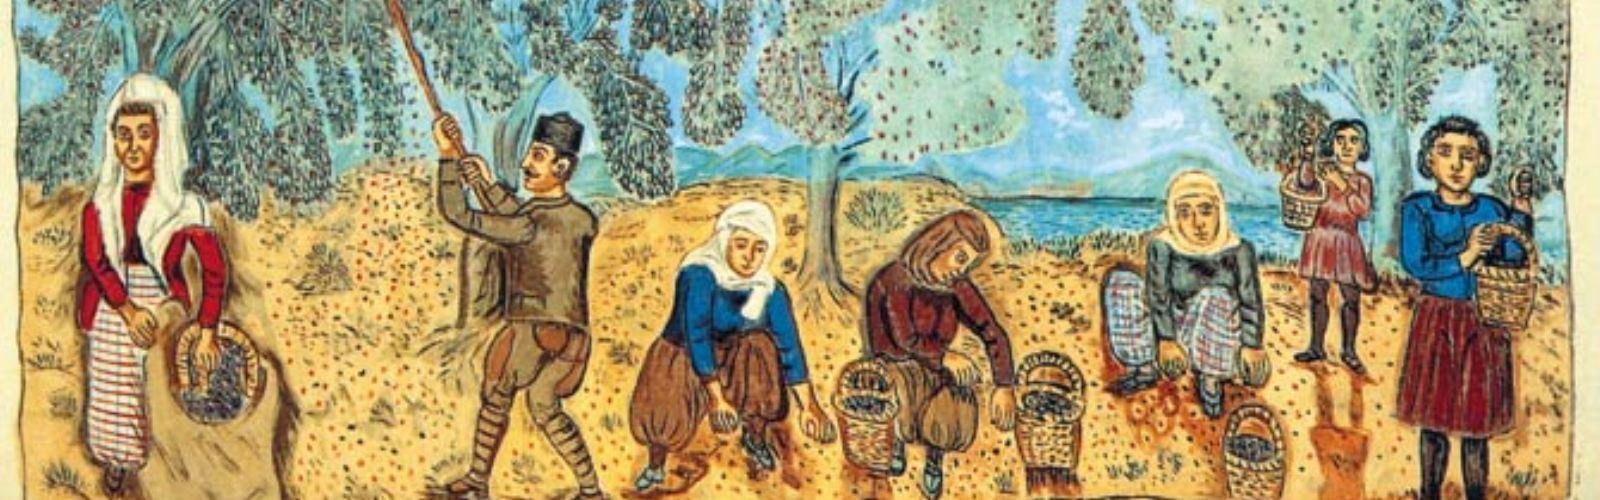 theofilos-painting-olive-harvest-min